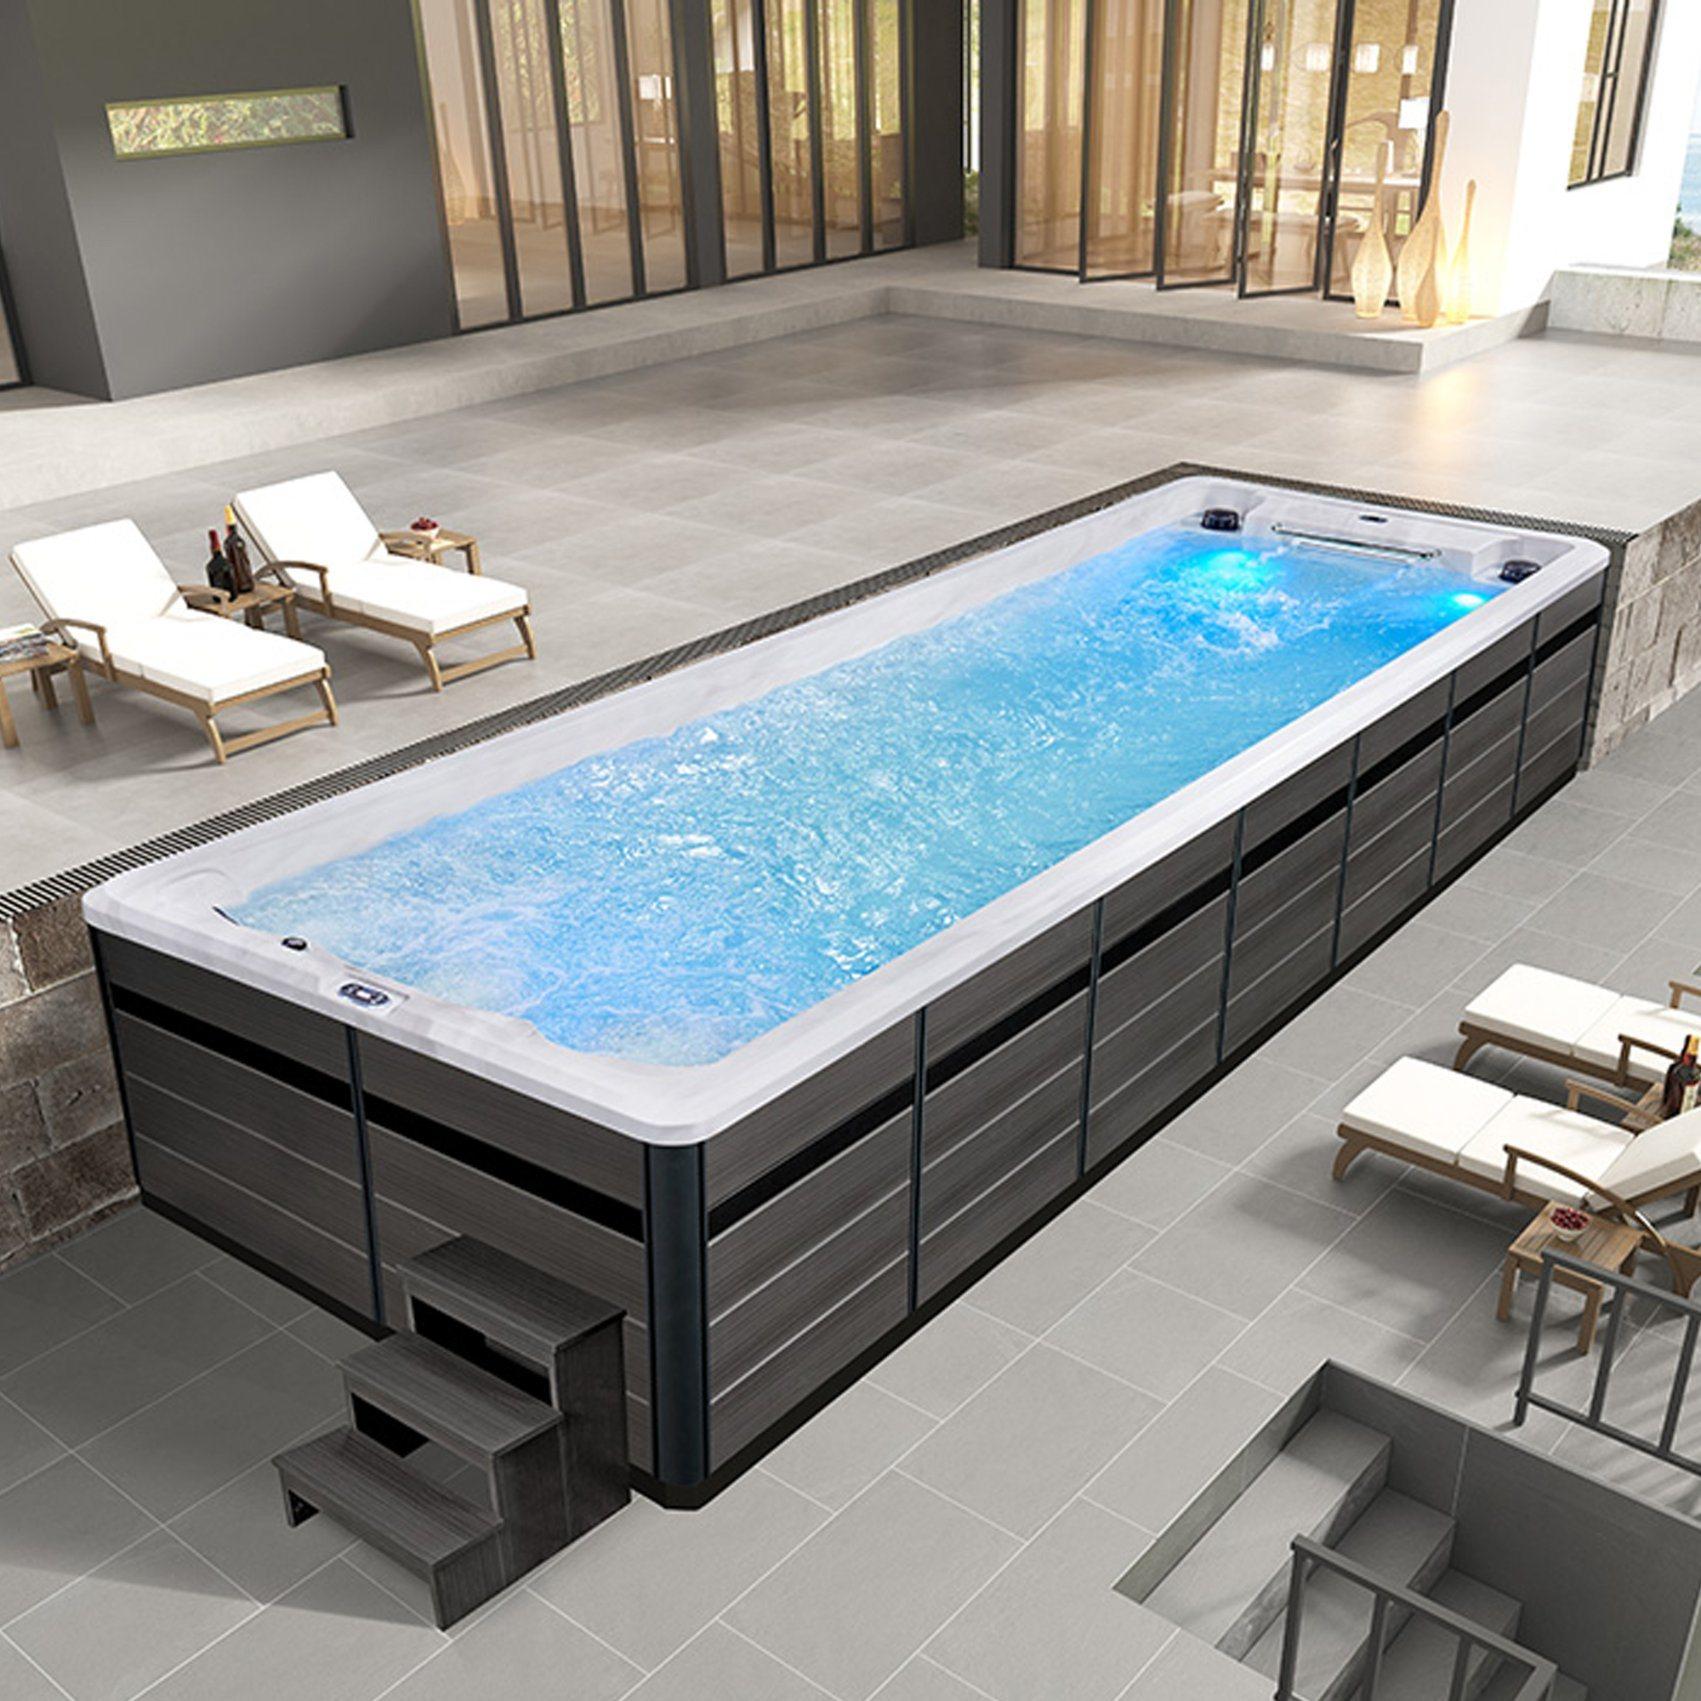 China Modern Family Use Above Ground Fibreglass Swimming Pool China Pool And Swimming Pool Price